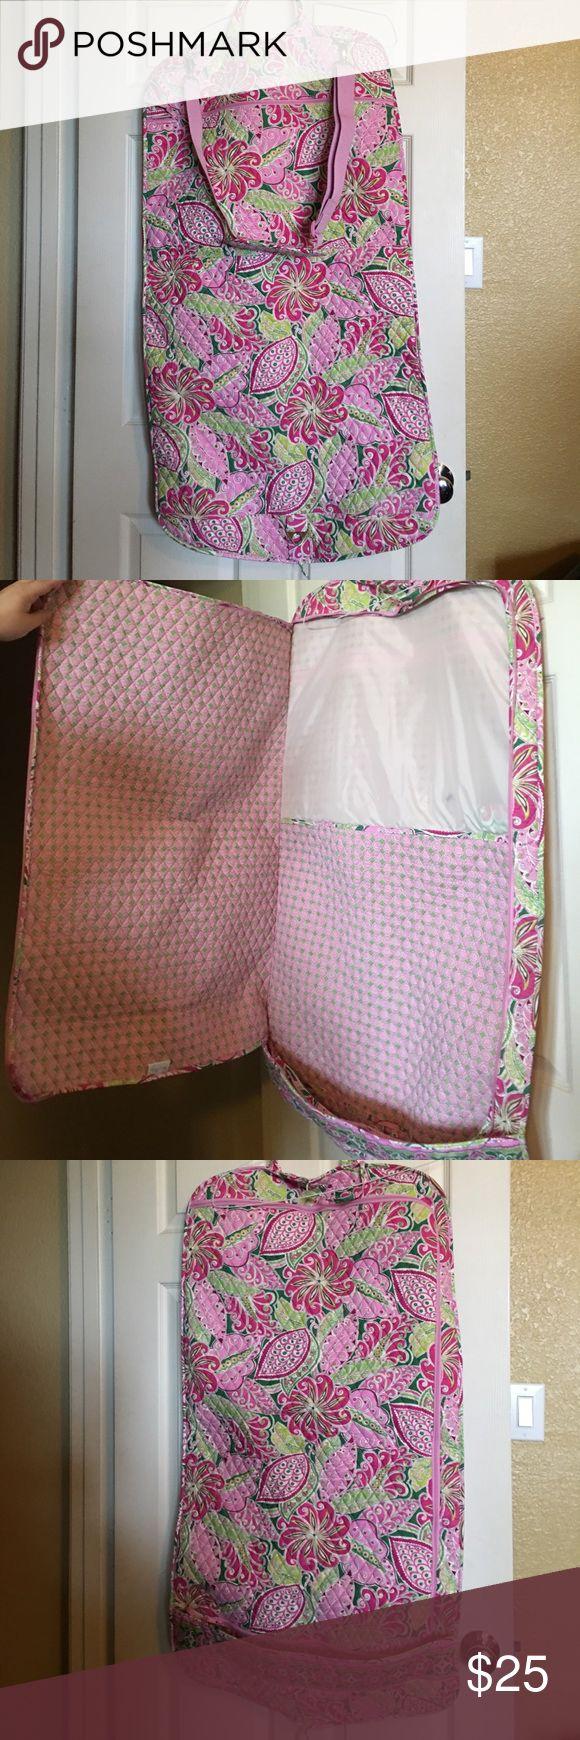 Vera Bradley Garment bag Super cute, excellent condition. Vera Bradley Bags Travel Bags